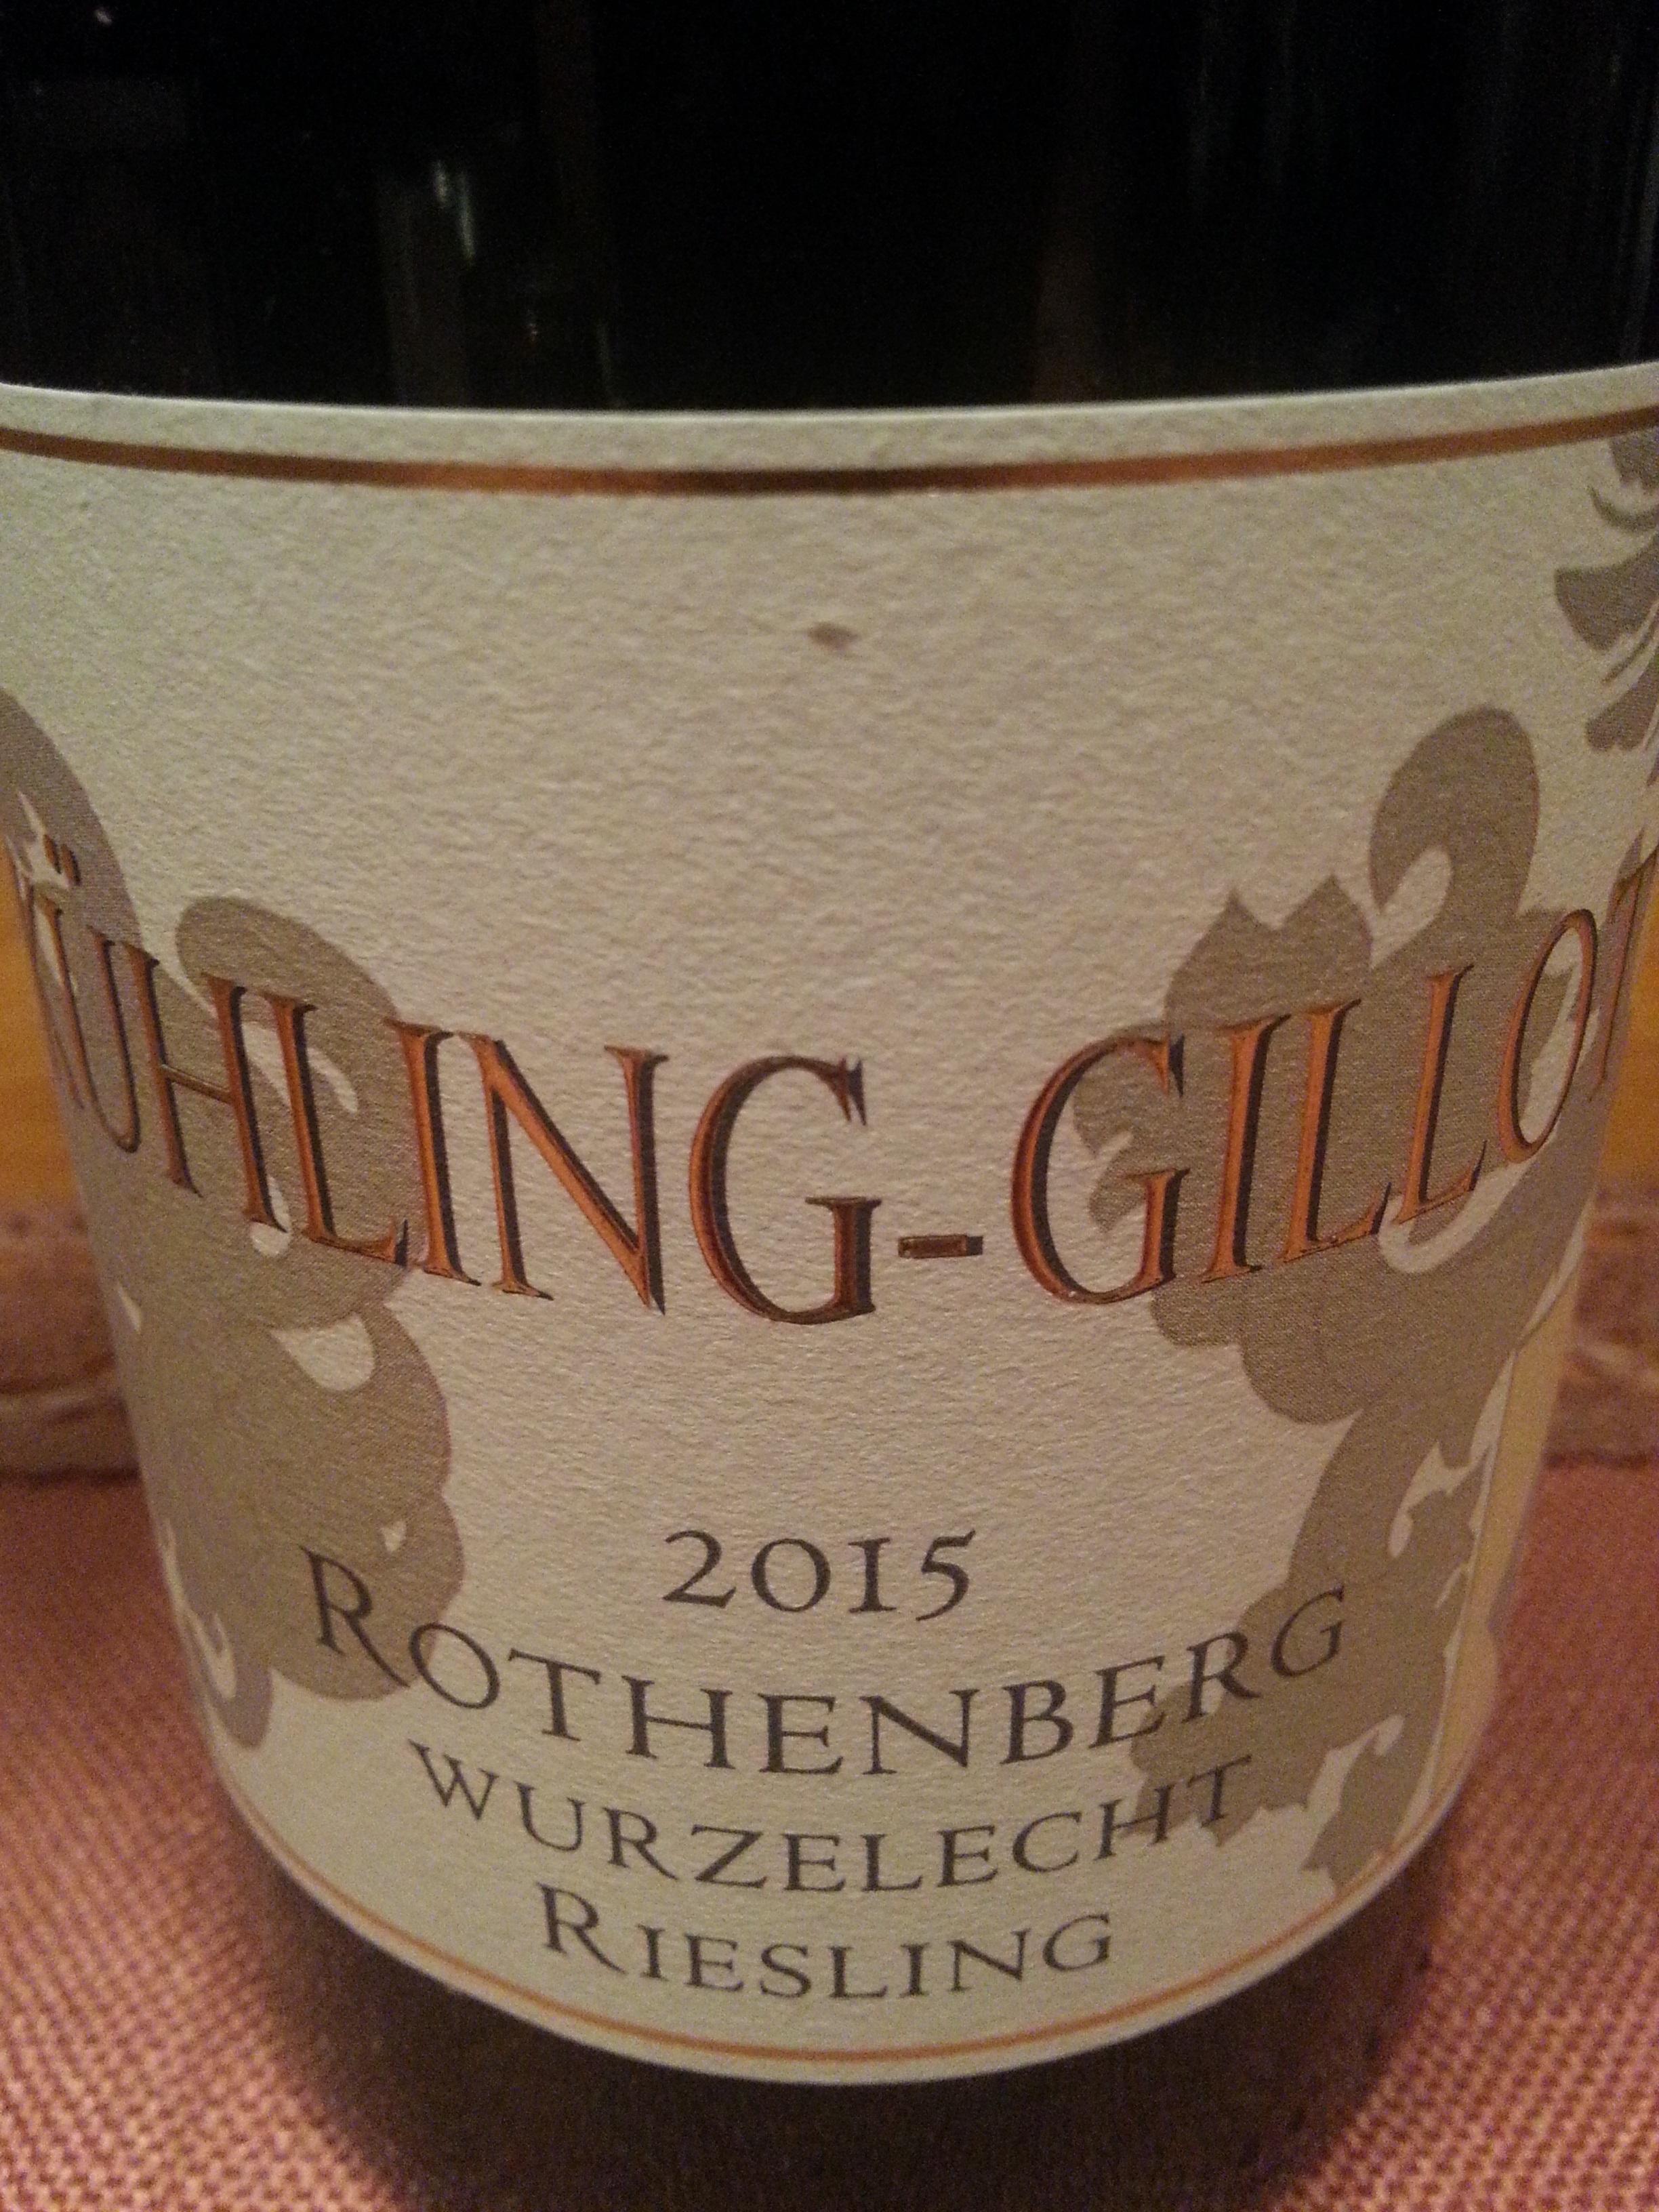 2015 Riesling Rothenberg Wurzelecht GG | Kühling-Gillot